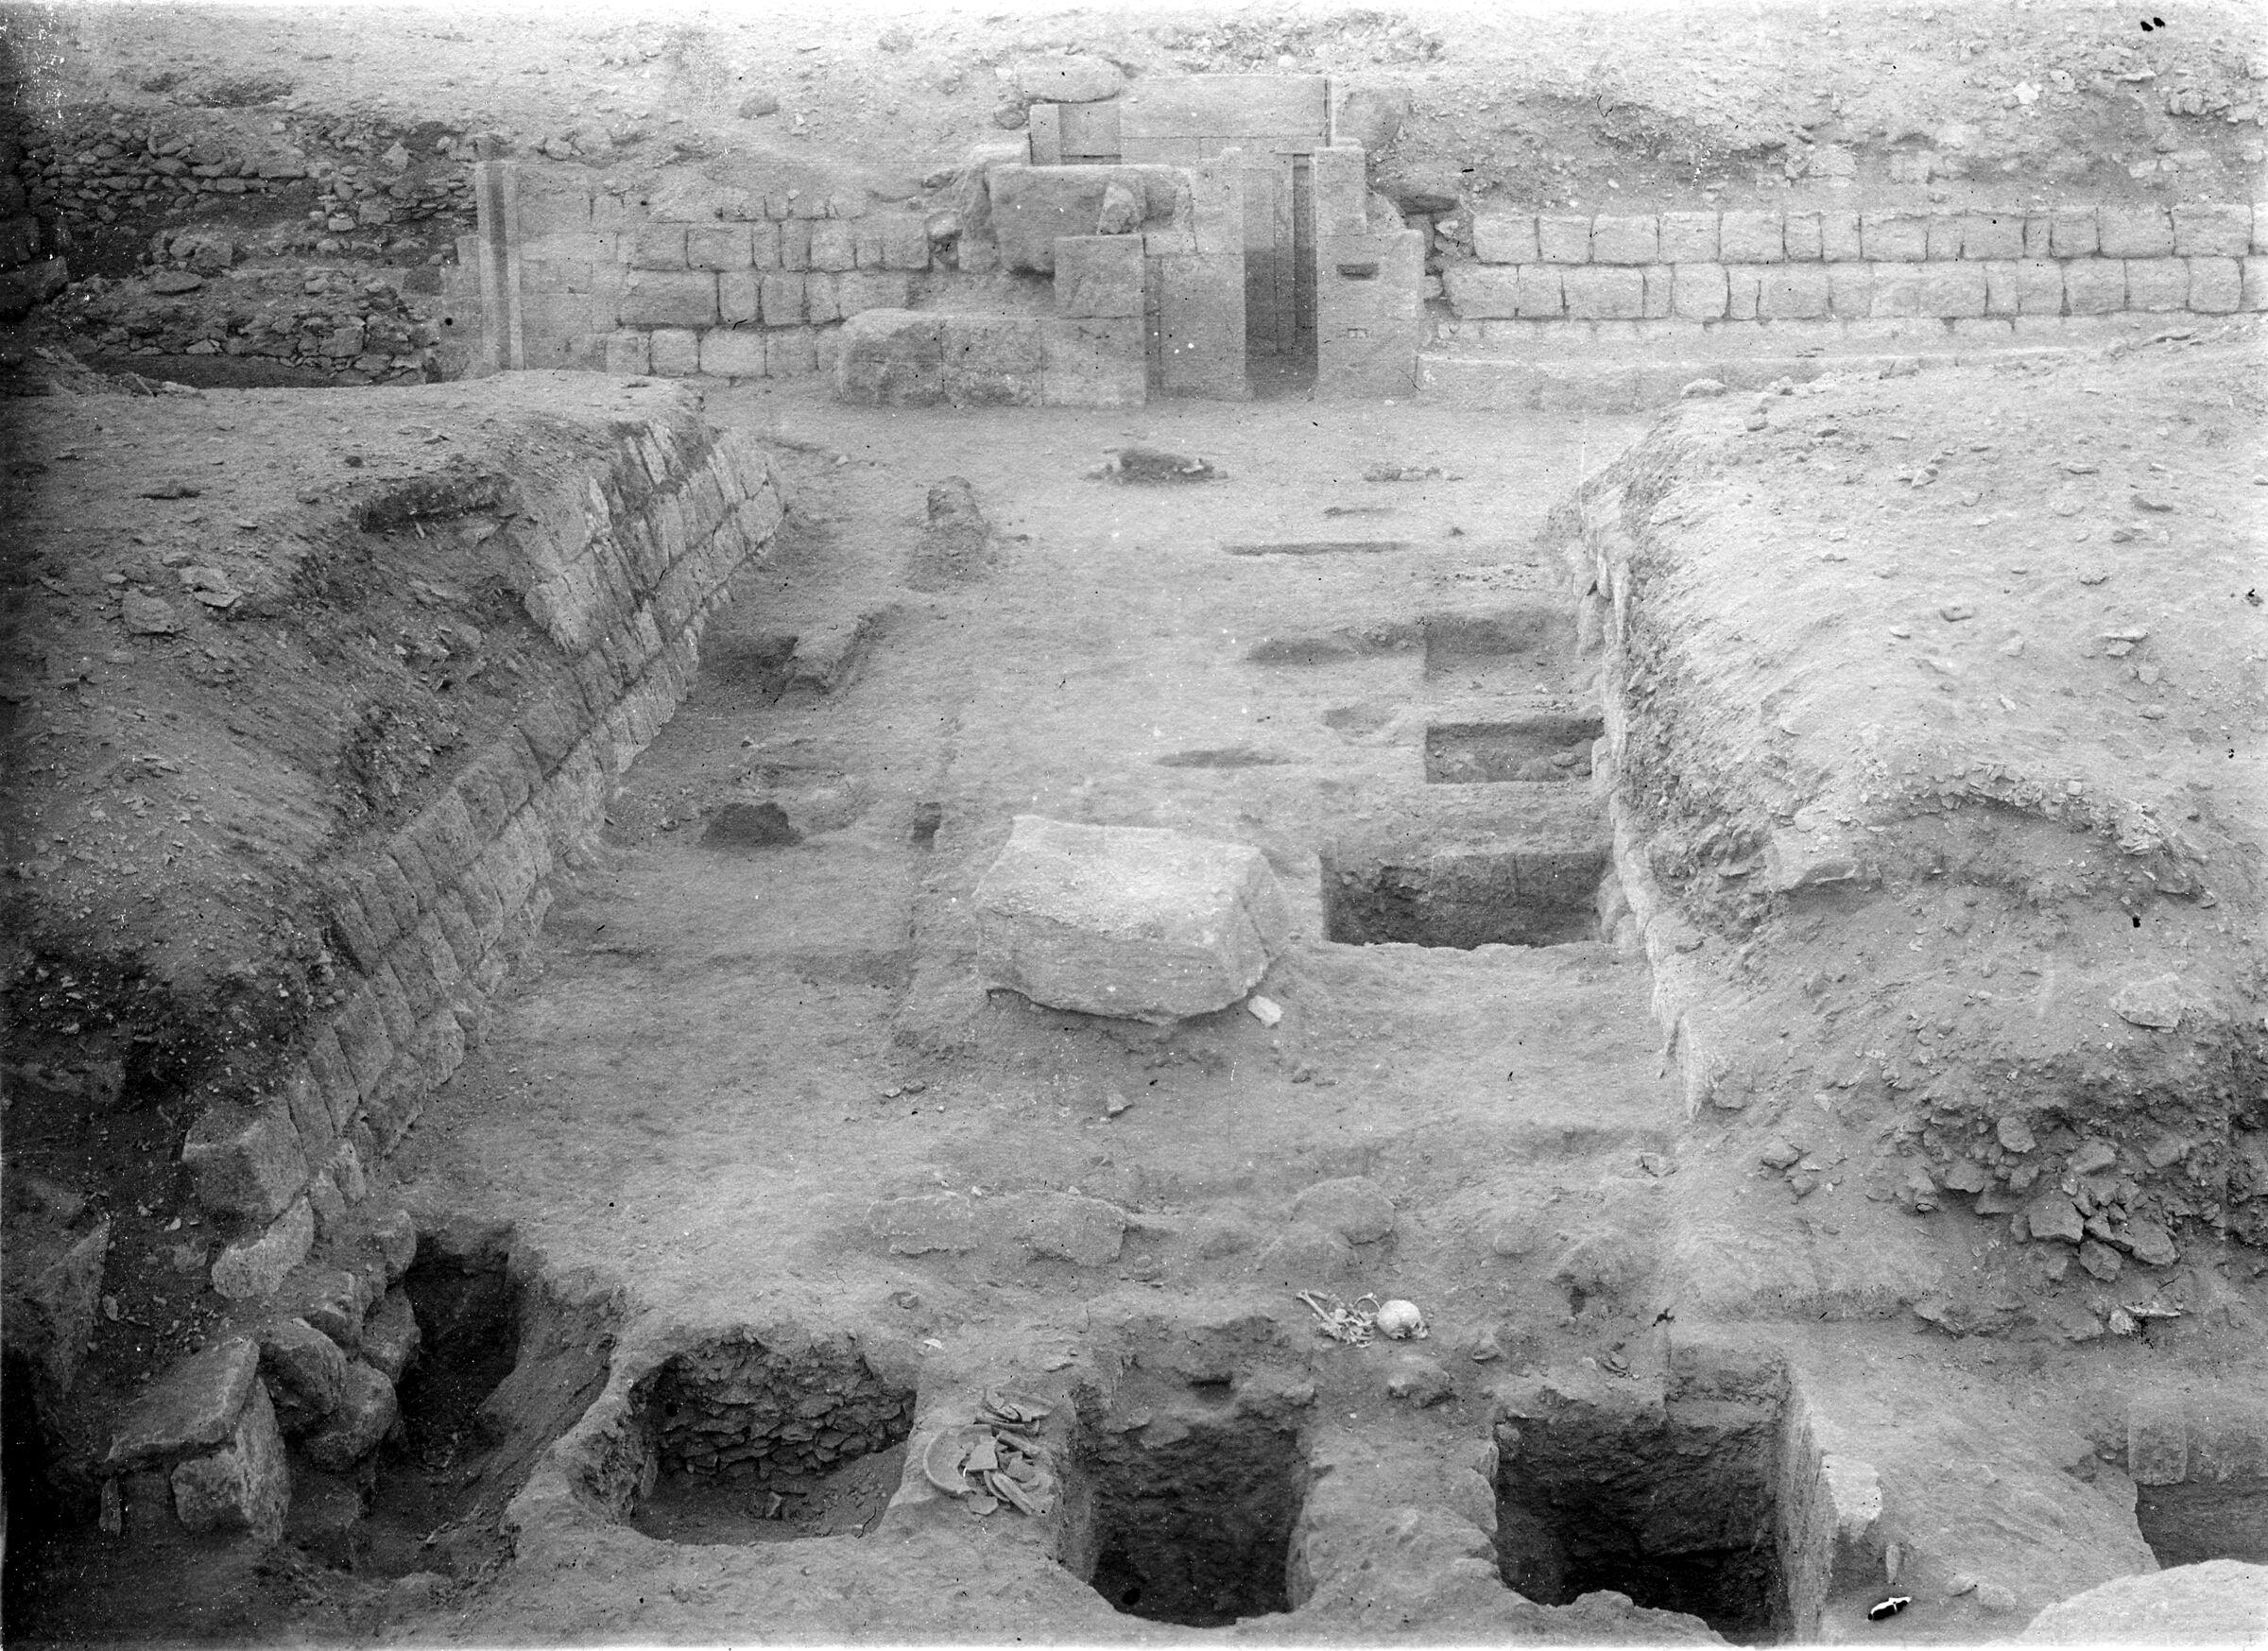 Western Cemetery: Site: Giza; View: G 5010, G 5020, G 5012, G 5011, G 4920